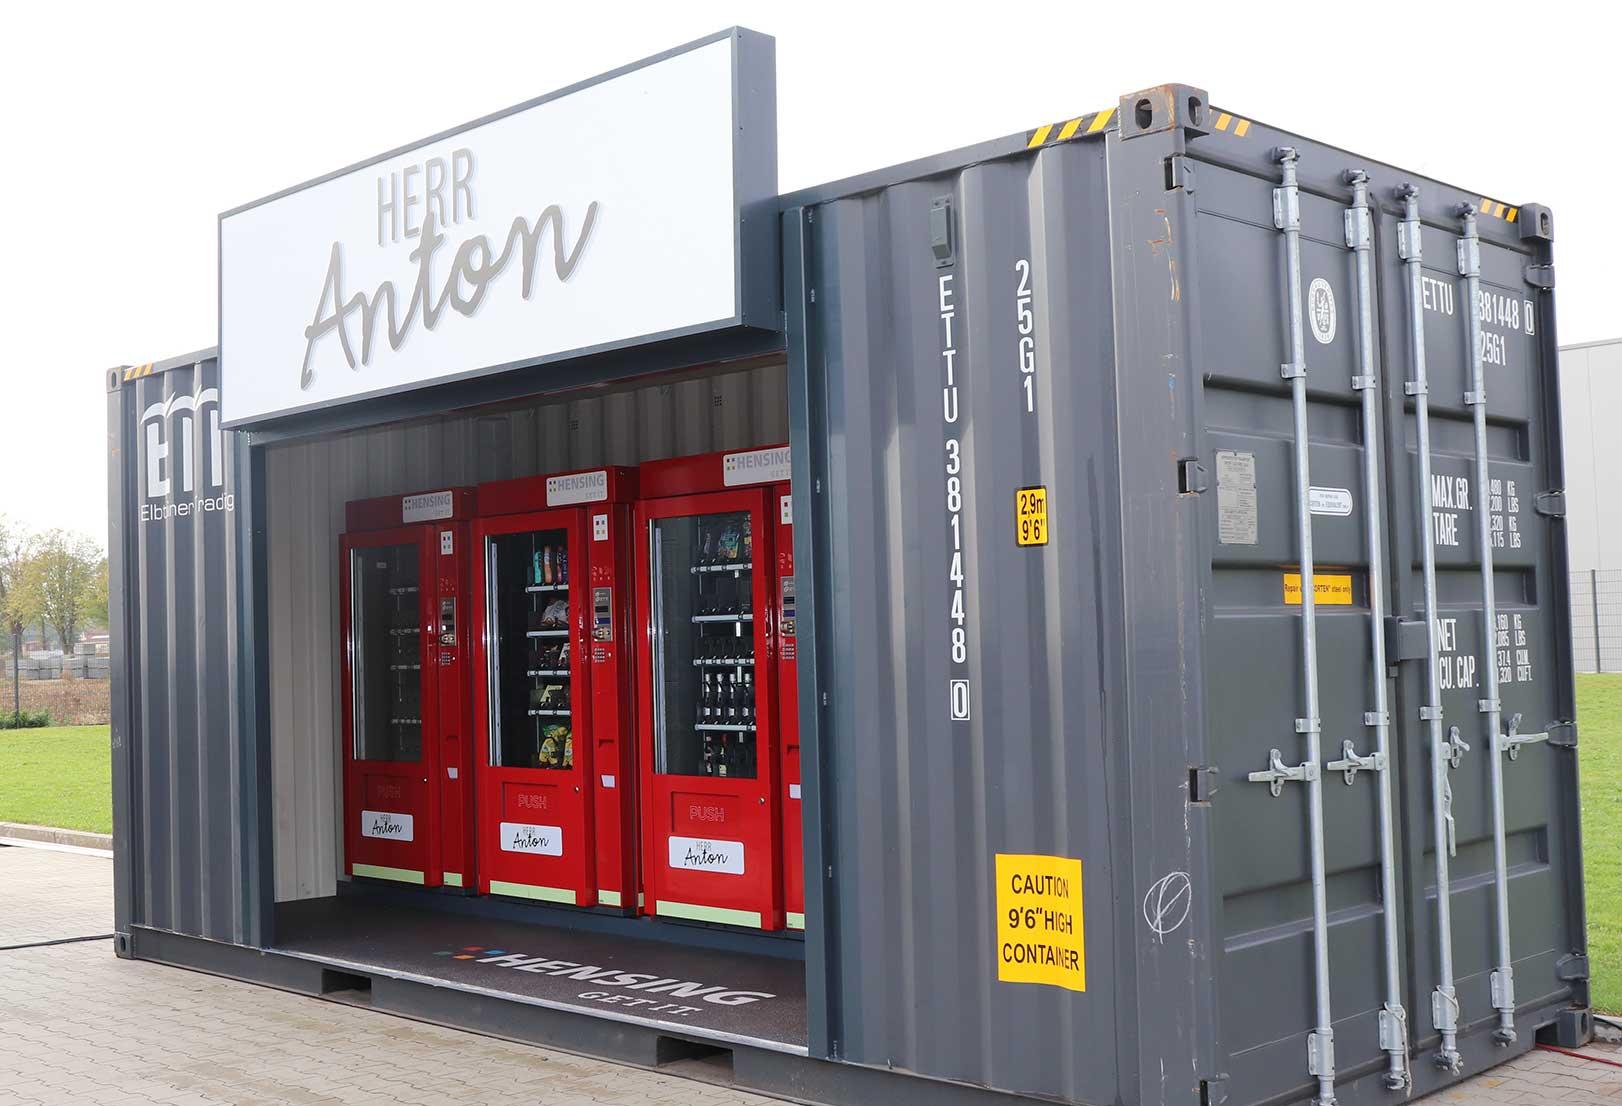 Herr Anton 20 Fuss Container